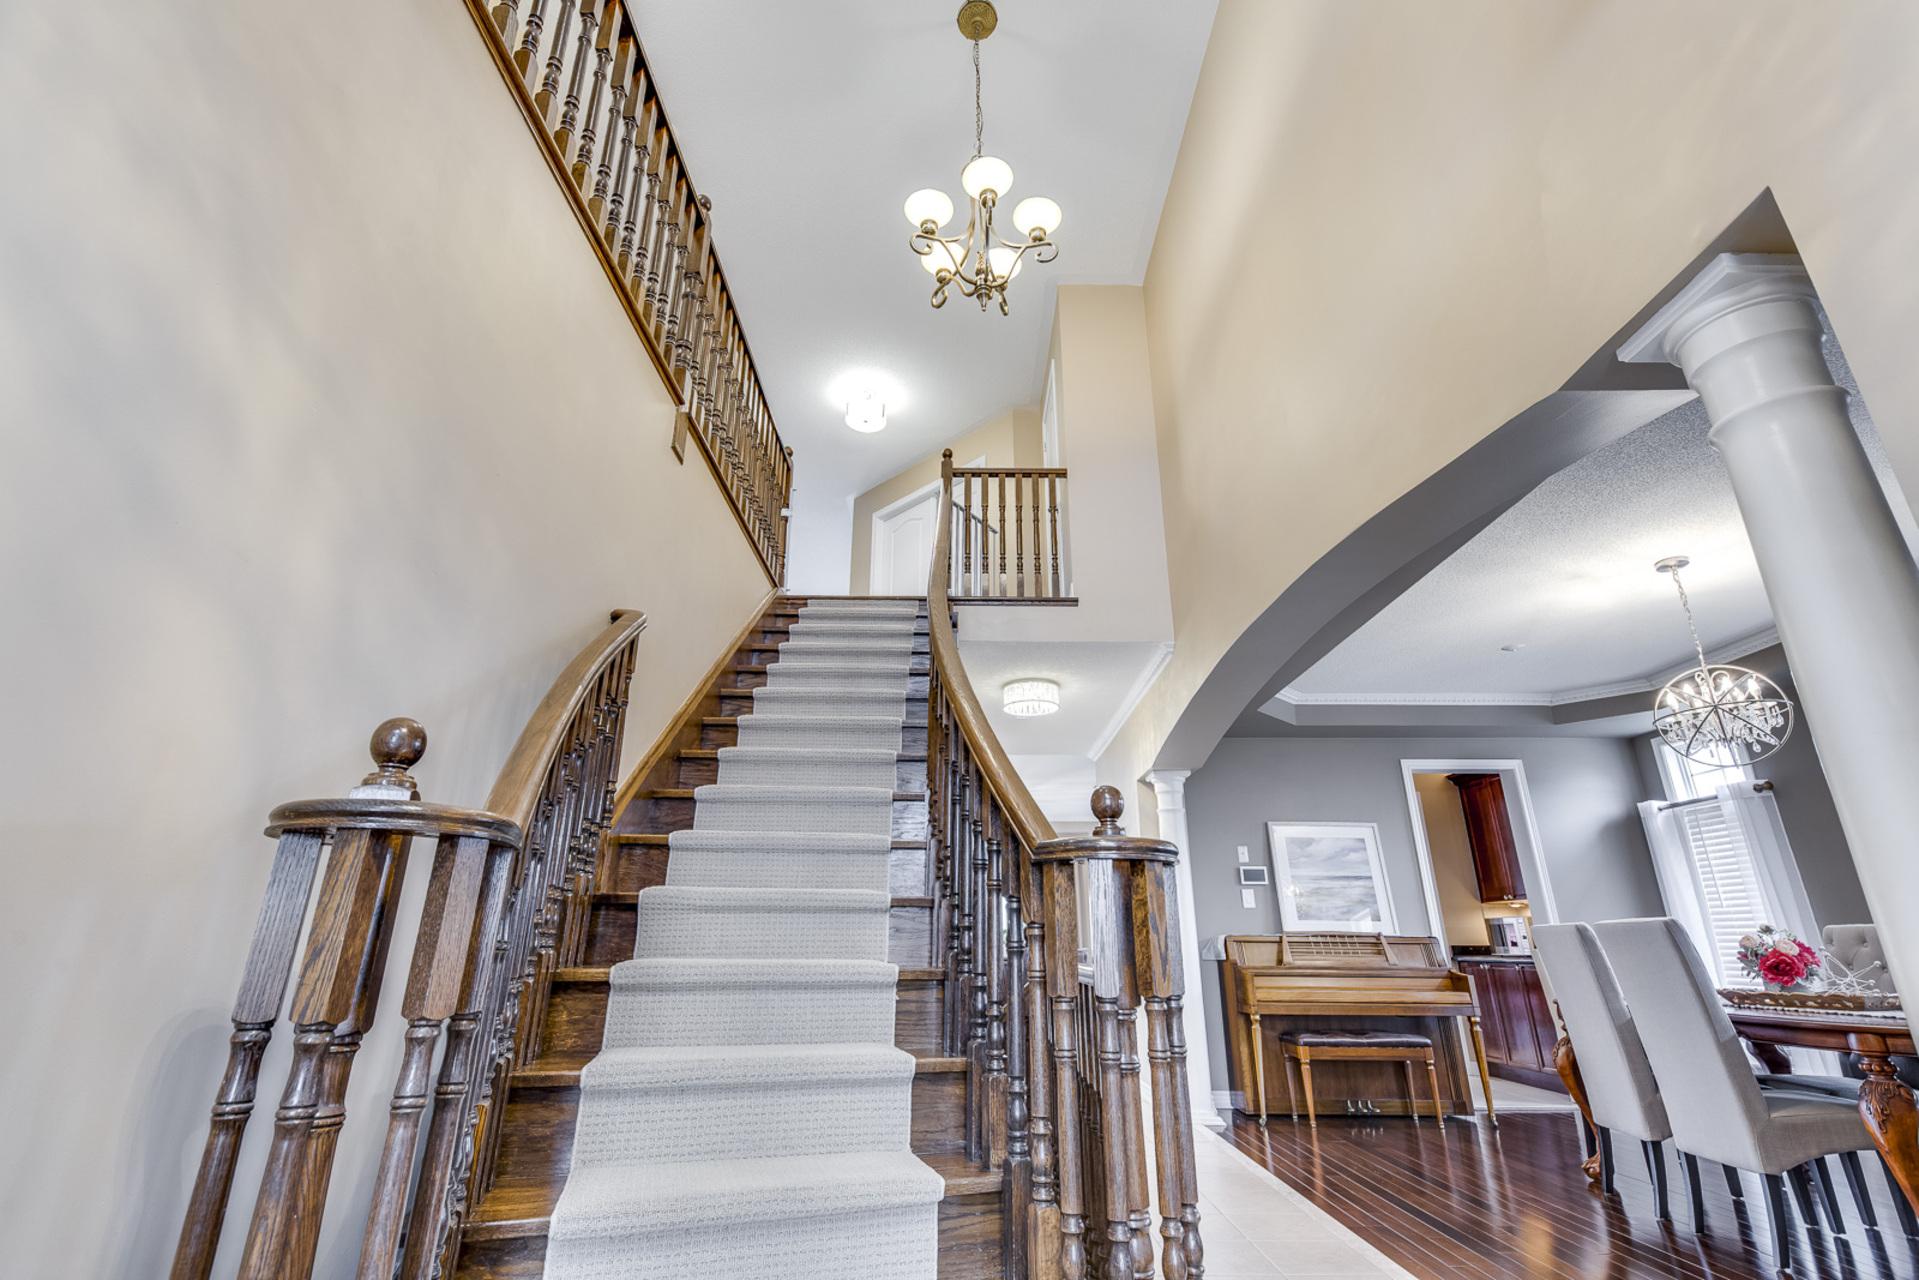 Staircase - 2395 Tesla Crescent, Oakville - Elite3 & Team at 2395 Tesla Crescent, Iroquois Ridge North, Oakville